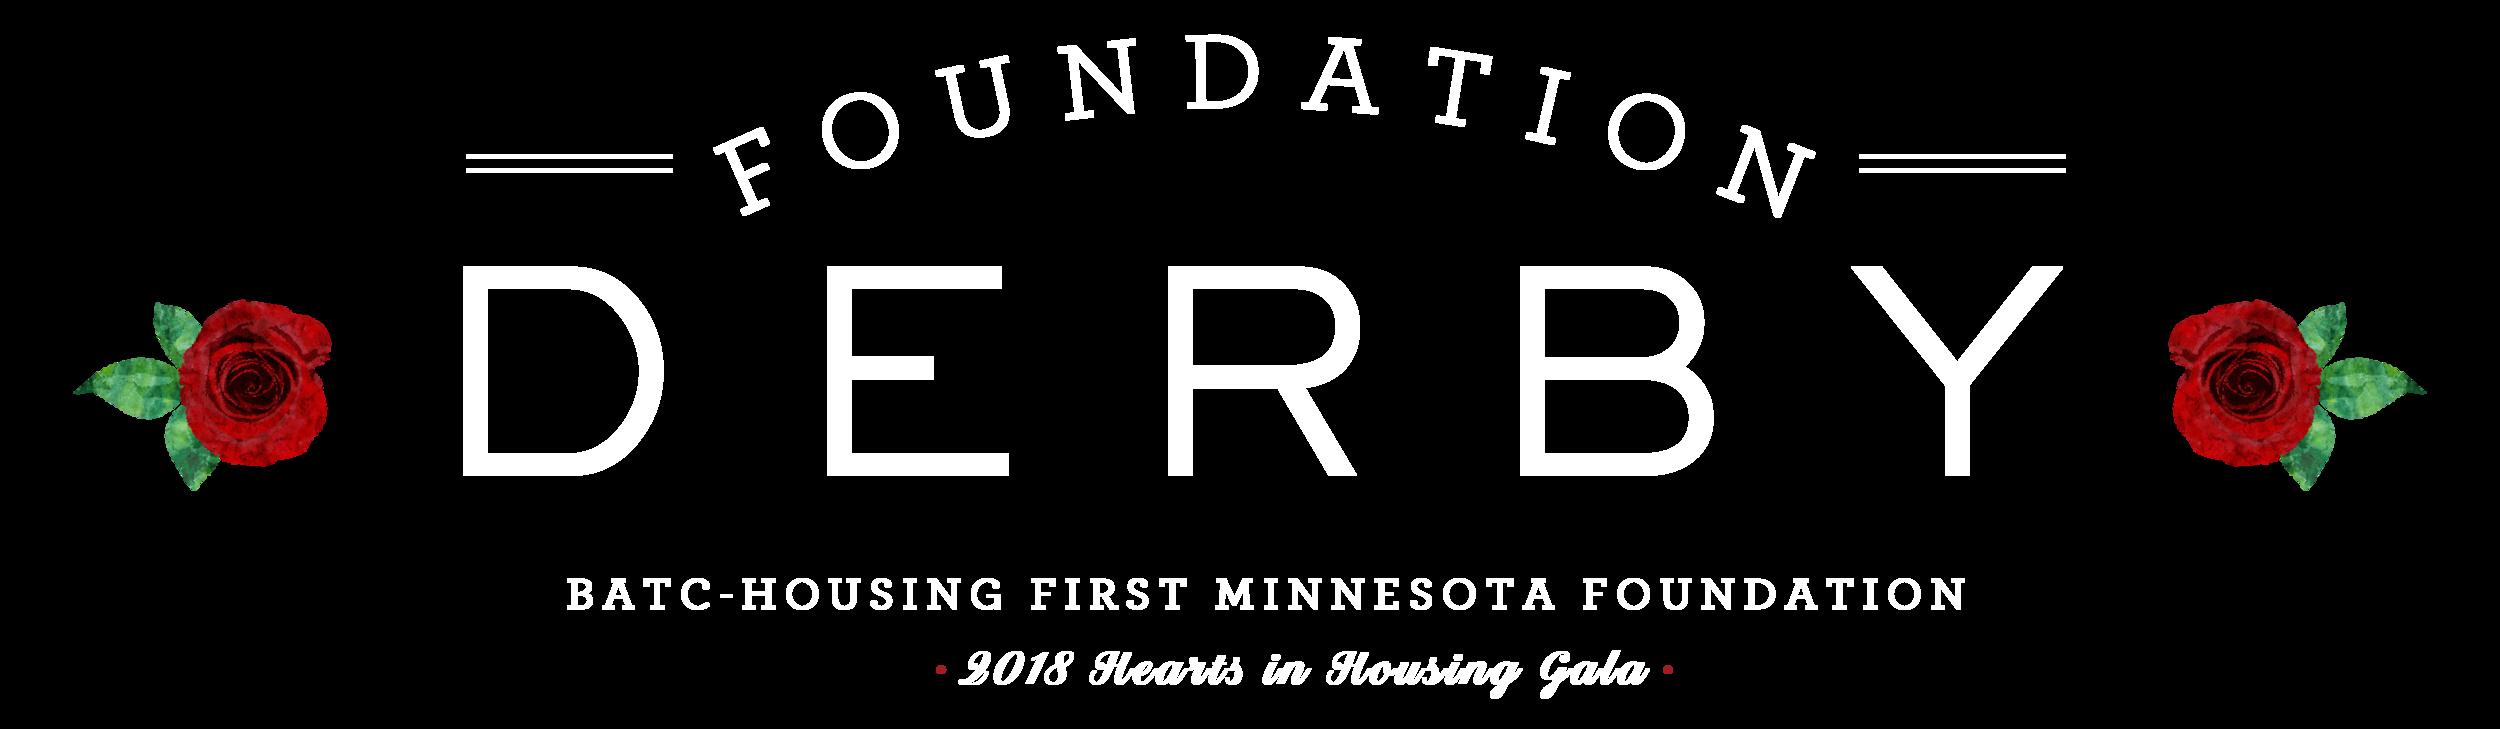 Derby-Logo-Reversed.png